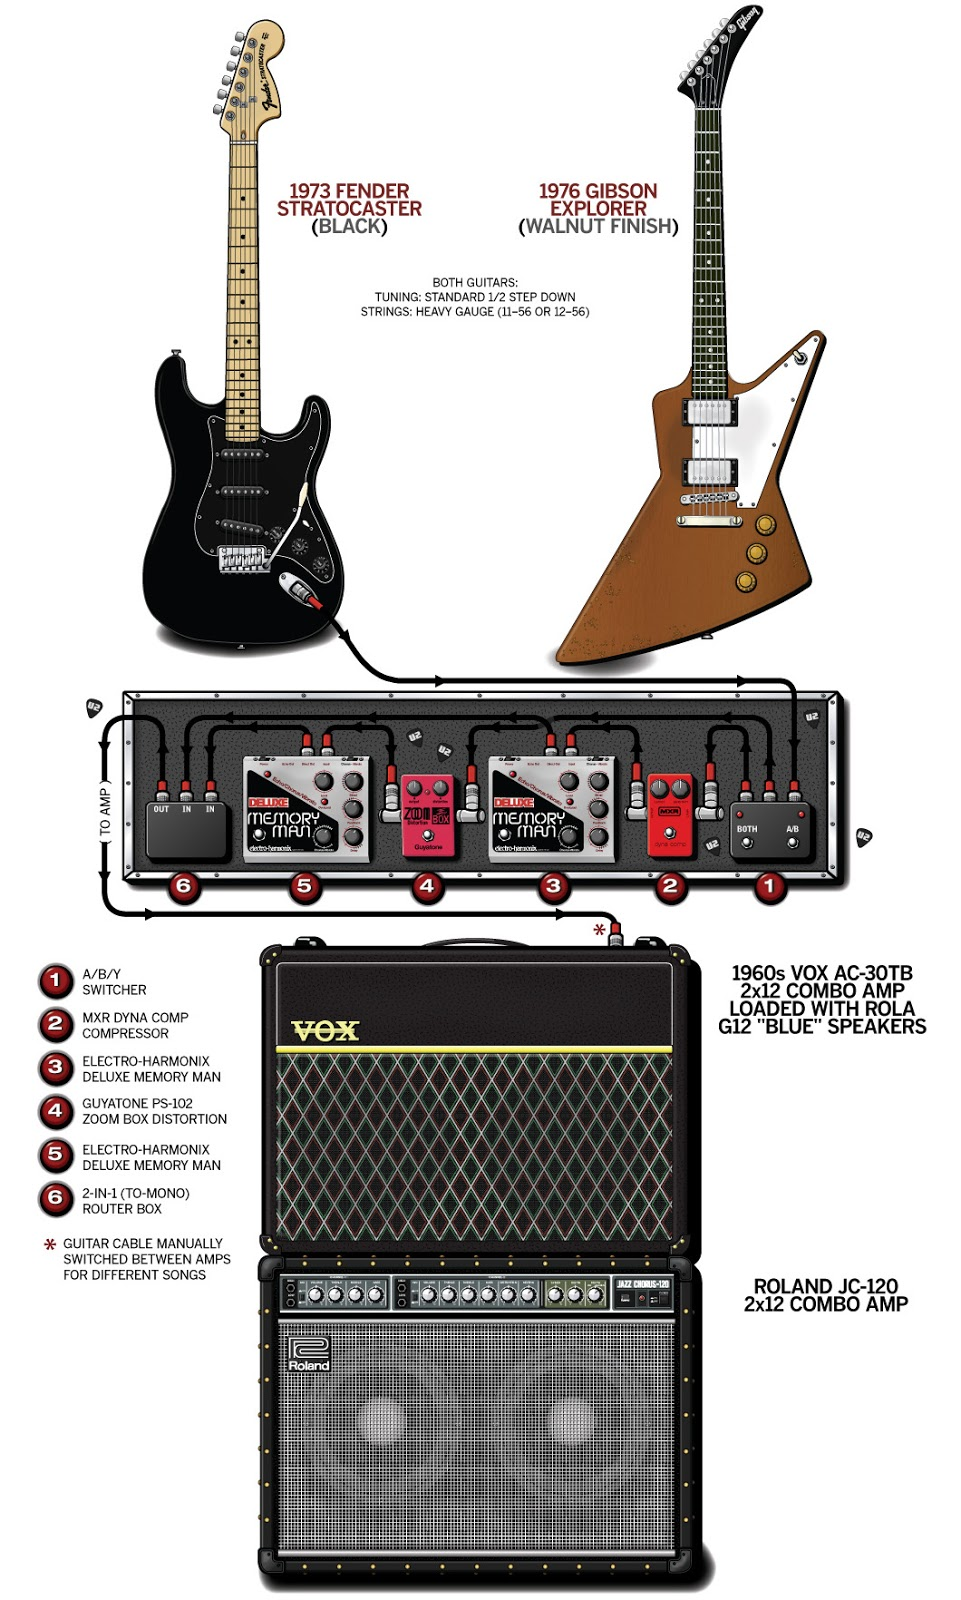 Jw Guitarworks Schematics Updated As I Find New Examples Mark Knopfler Strat Wiring Diagram U2 The Edge Rig